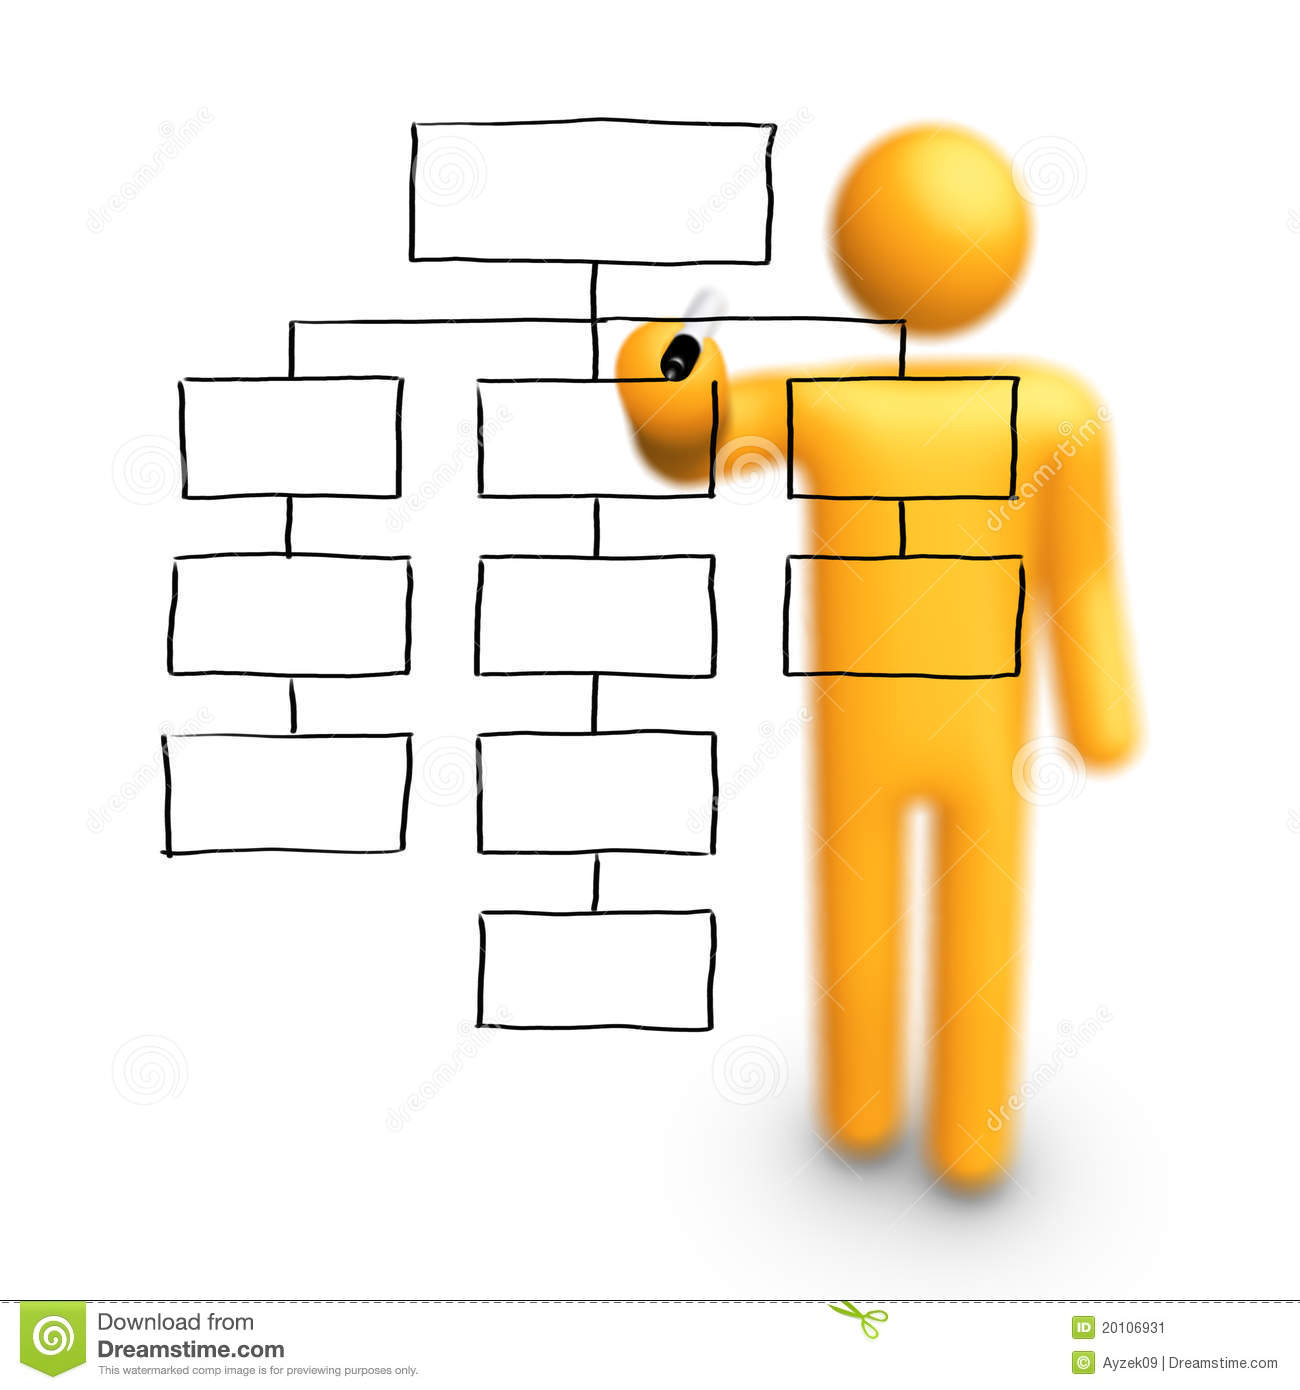 Organization Chart Clip Art .-organization chart clip art .-9